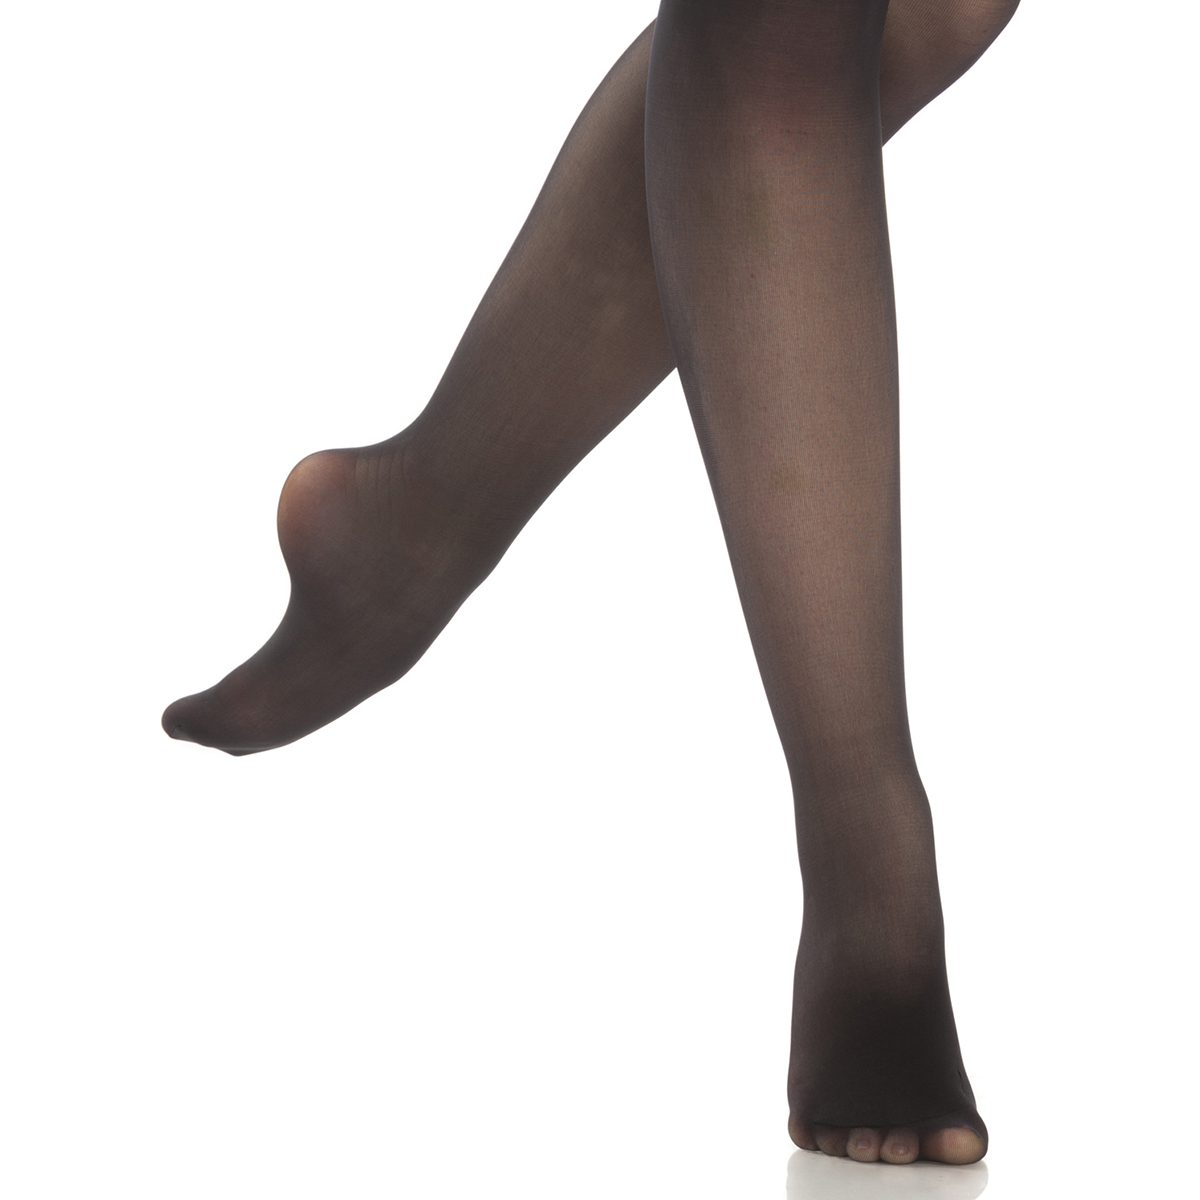 a8a0e38b72360 Energetiks Sheer Dance Pantyhose - Adult - Dance Desire Dance Store